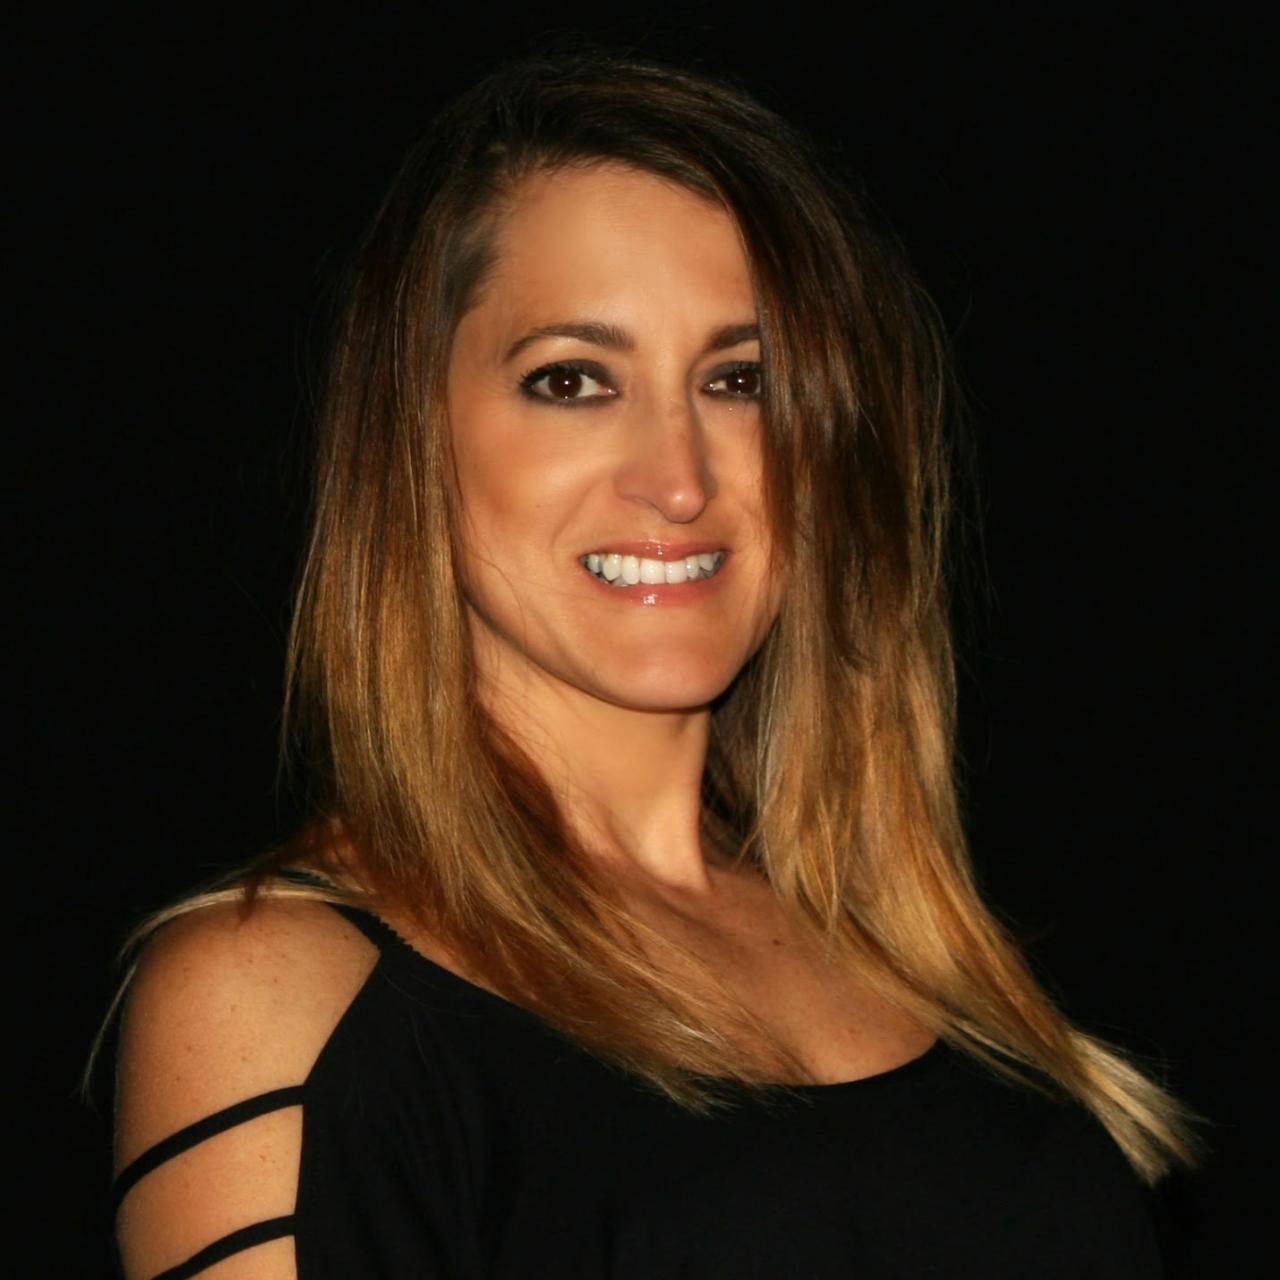 Fashion Nail Beauty Spa Elizabeth Nj: Allure Day Spa And Salon